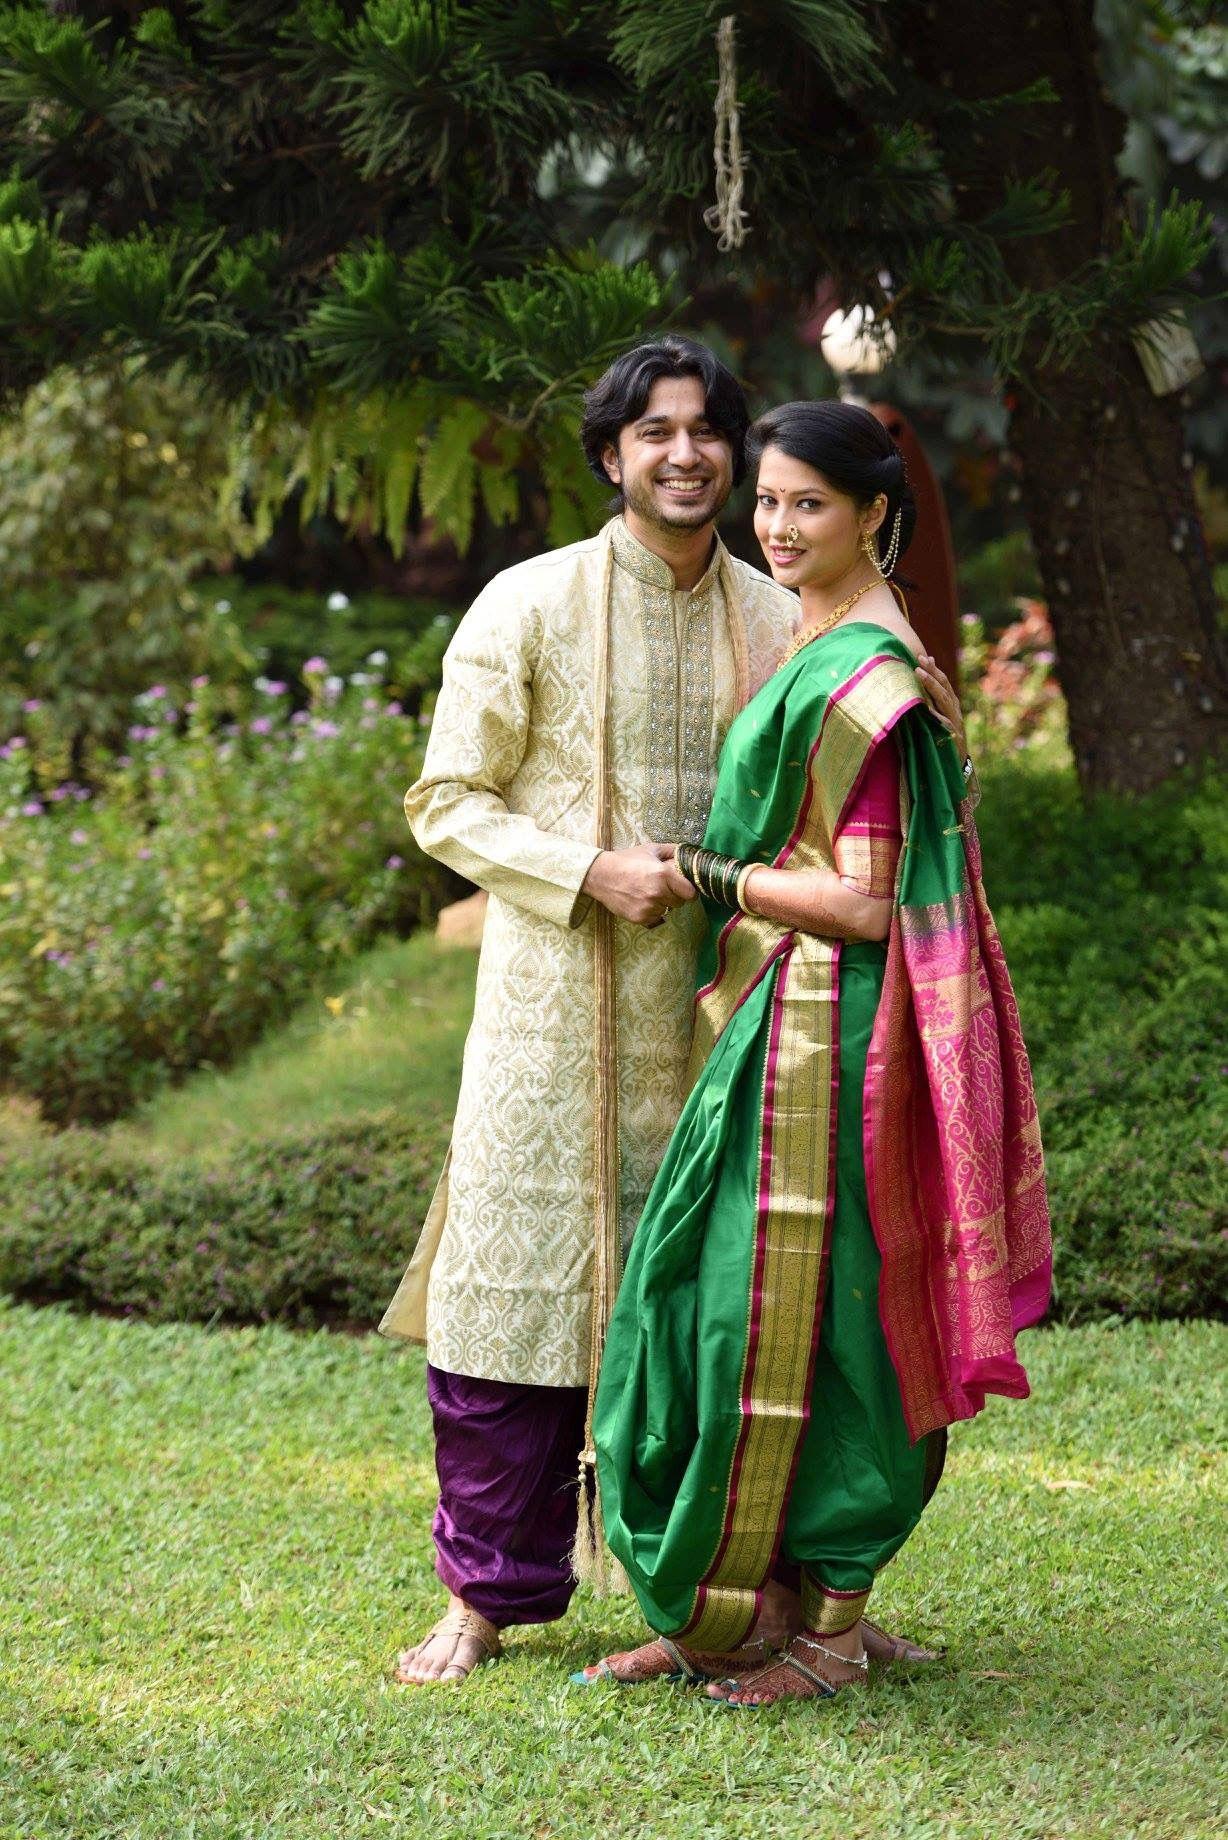 green nauwari 9 wari 9 yard sadi saree worn tirapa